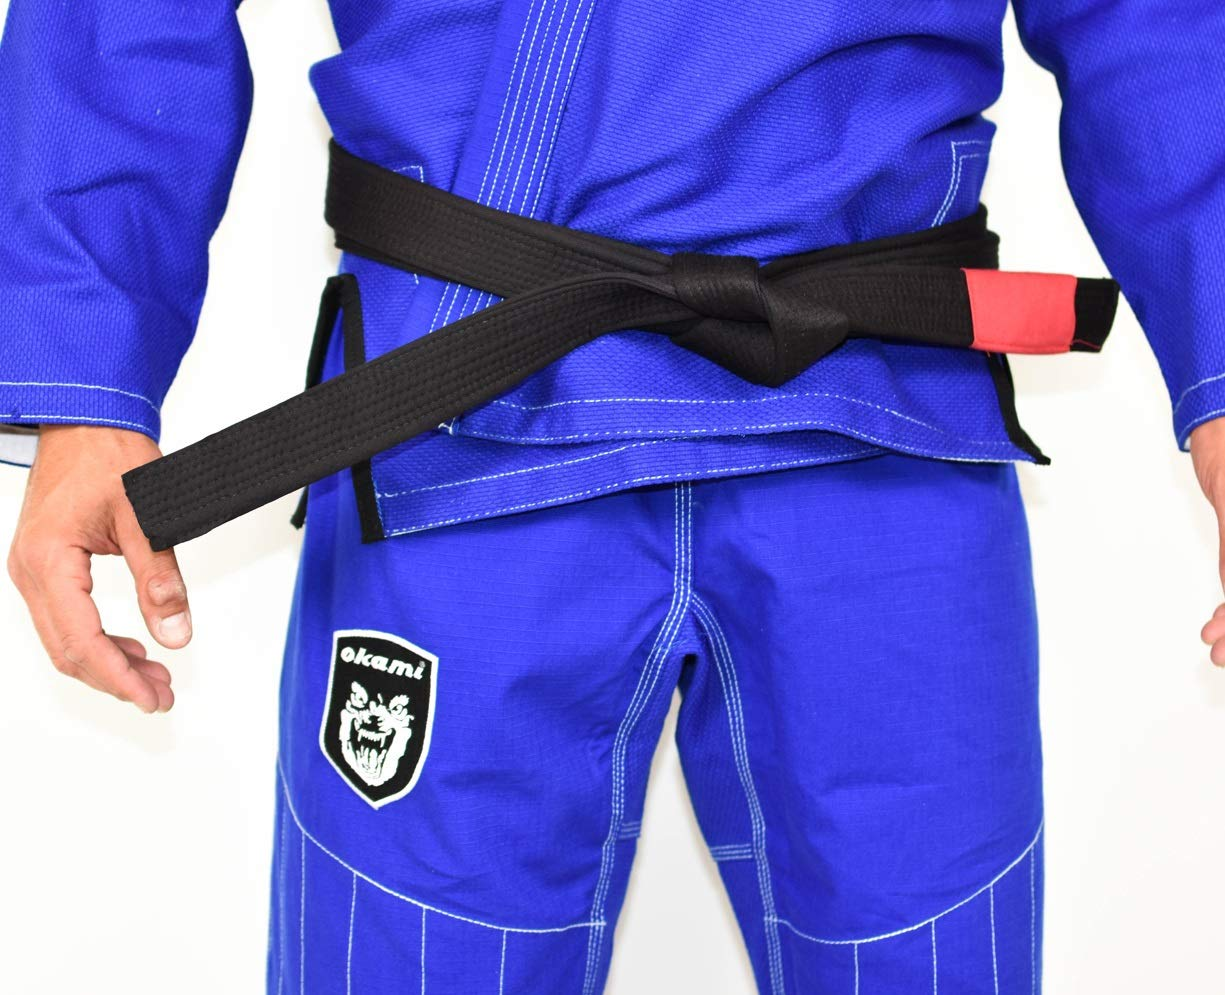 OKAMI Fightgear Uomo Shield BJJ GI